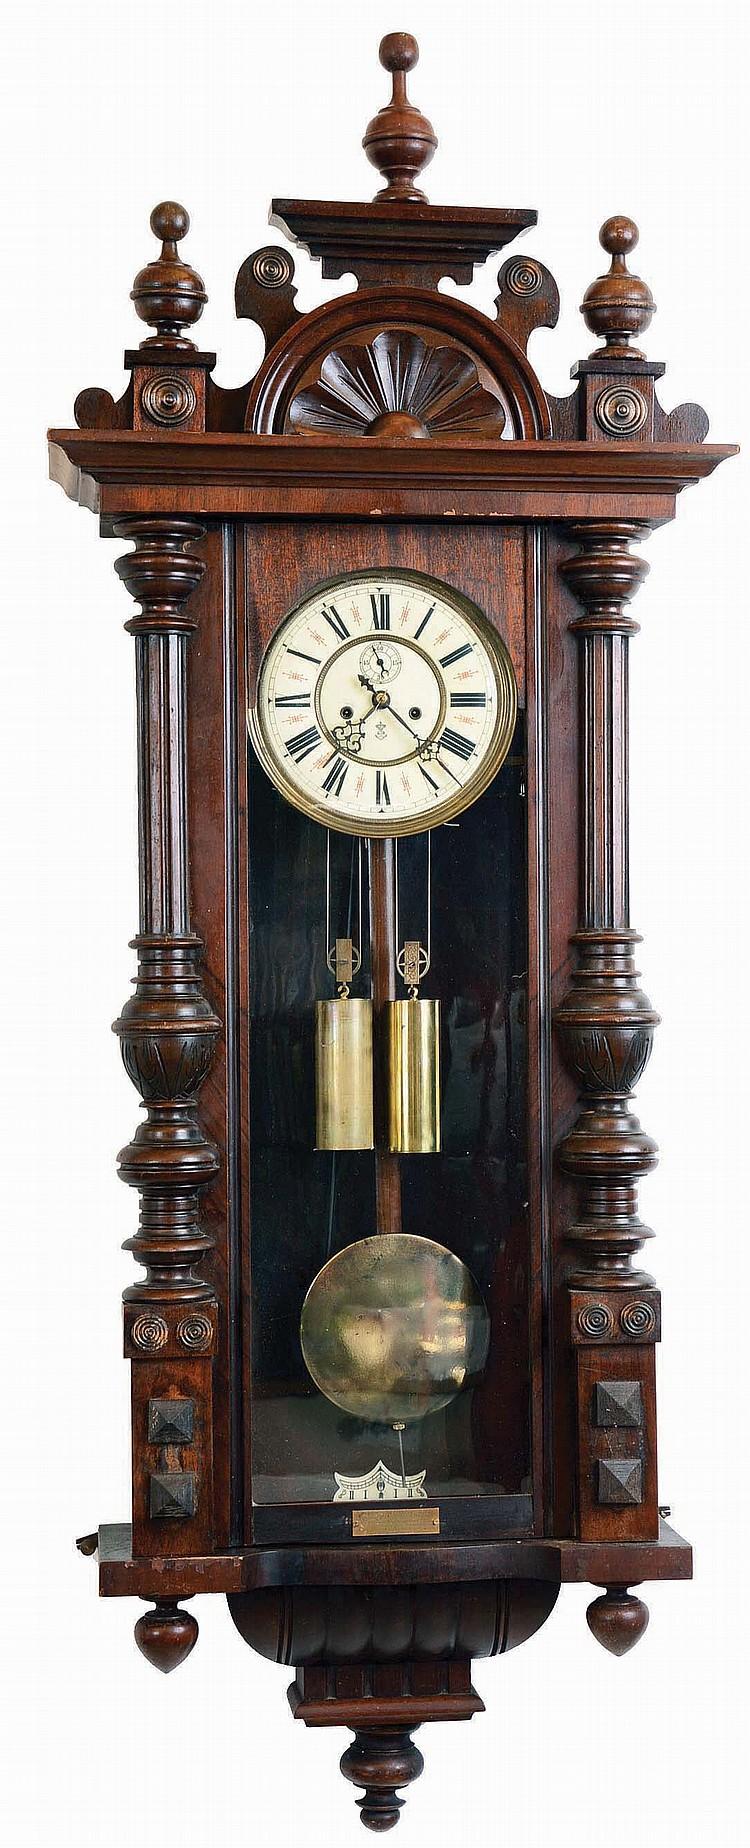 Clocks- 2 (Two) Vienna Regulator 2 Weight German Walnut Wall: Thomas Haller #11102 with multi- color dial; Gustav Becker #1882976, 1908 presentation plate